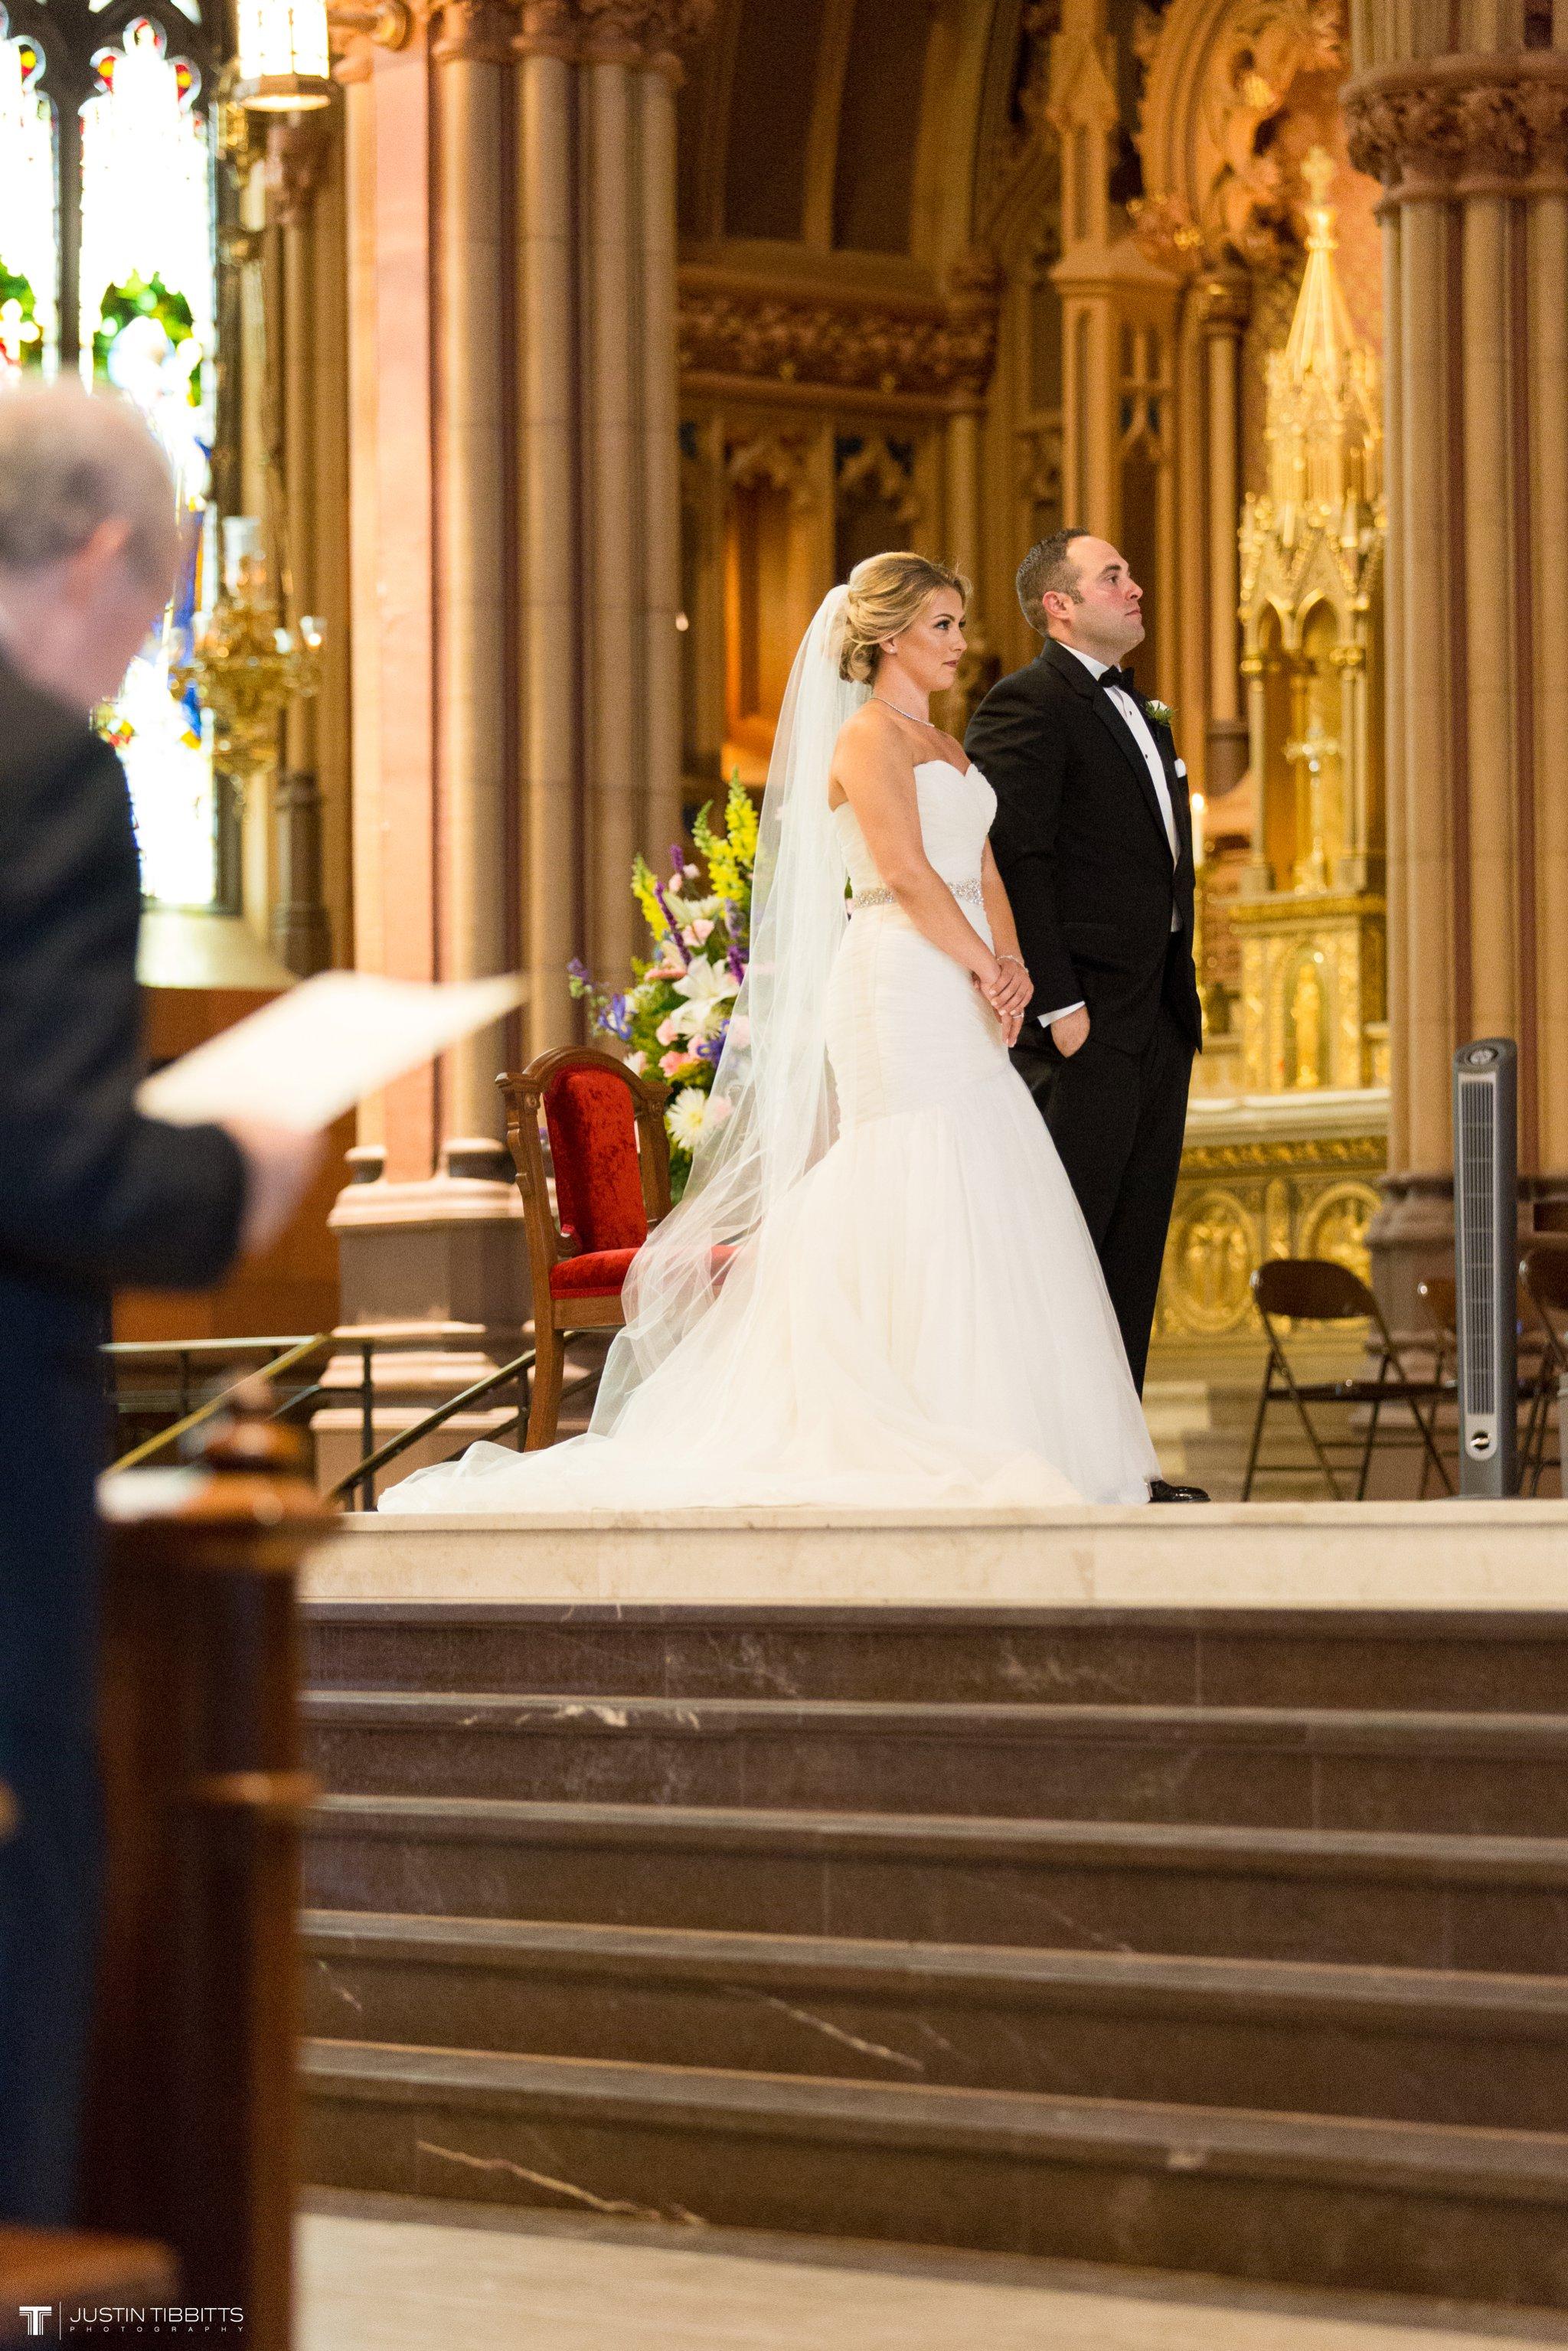 state-room-wedding-photos-with-amanda-and-nick_0085